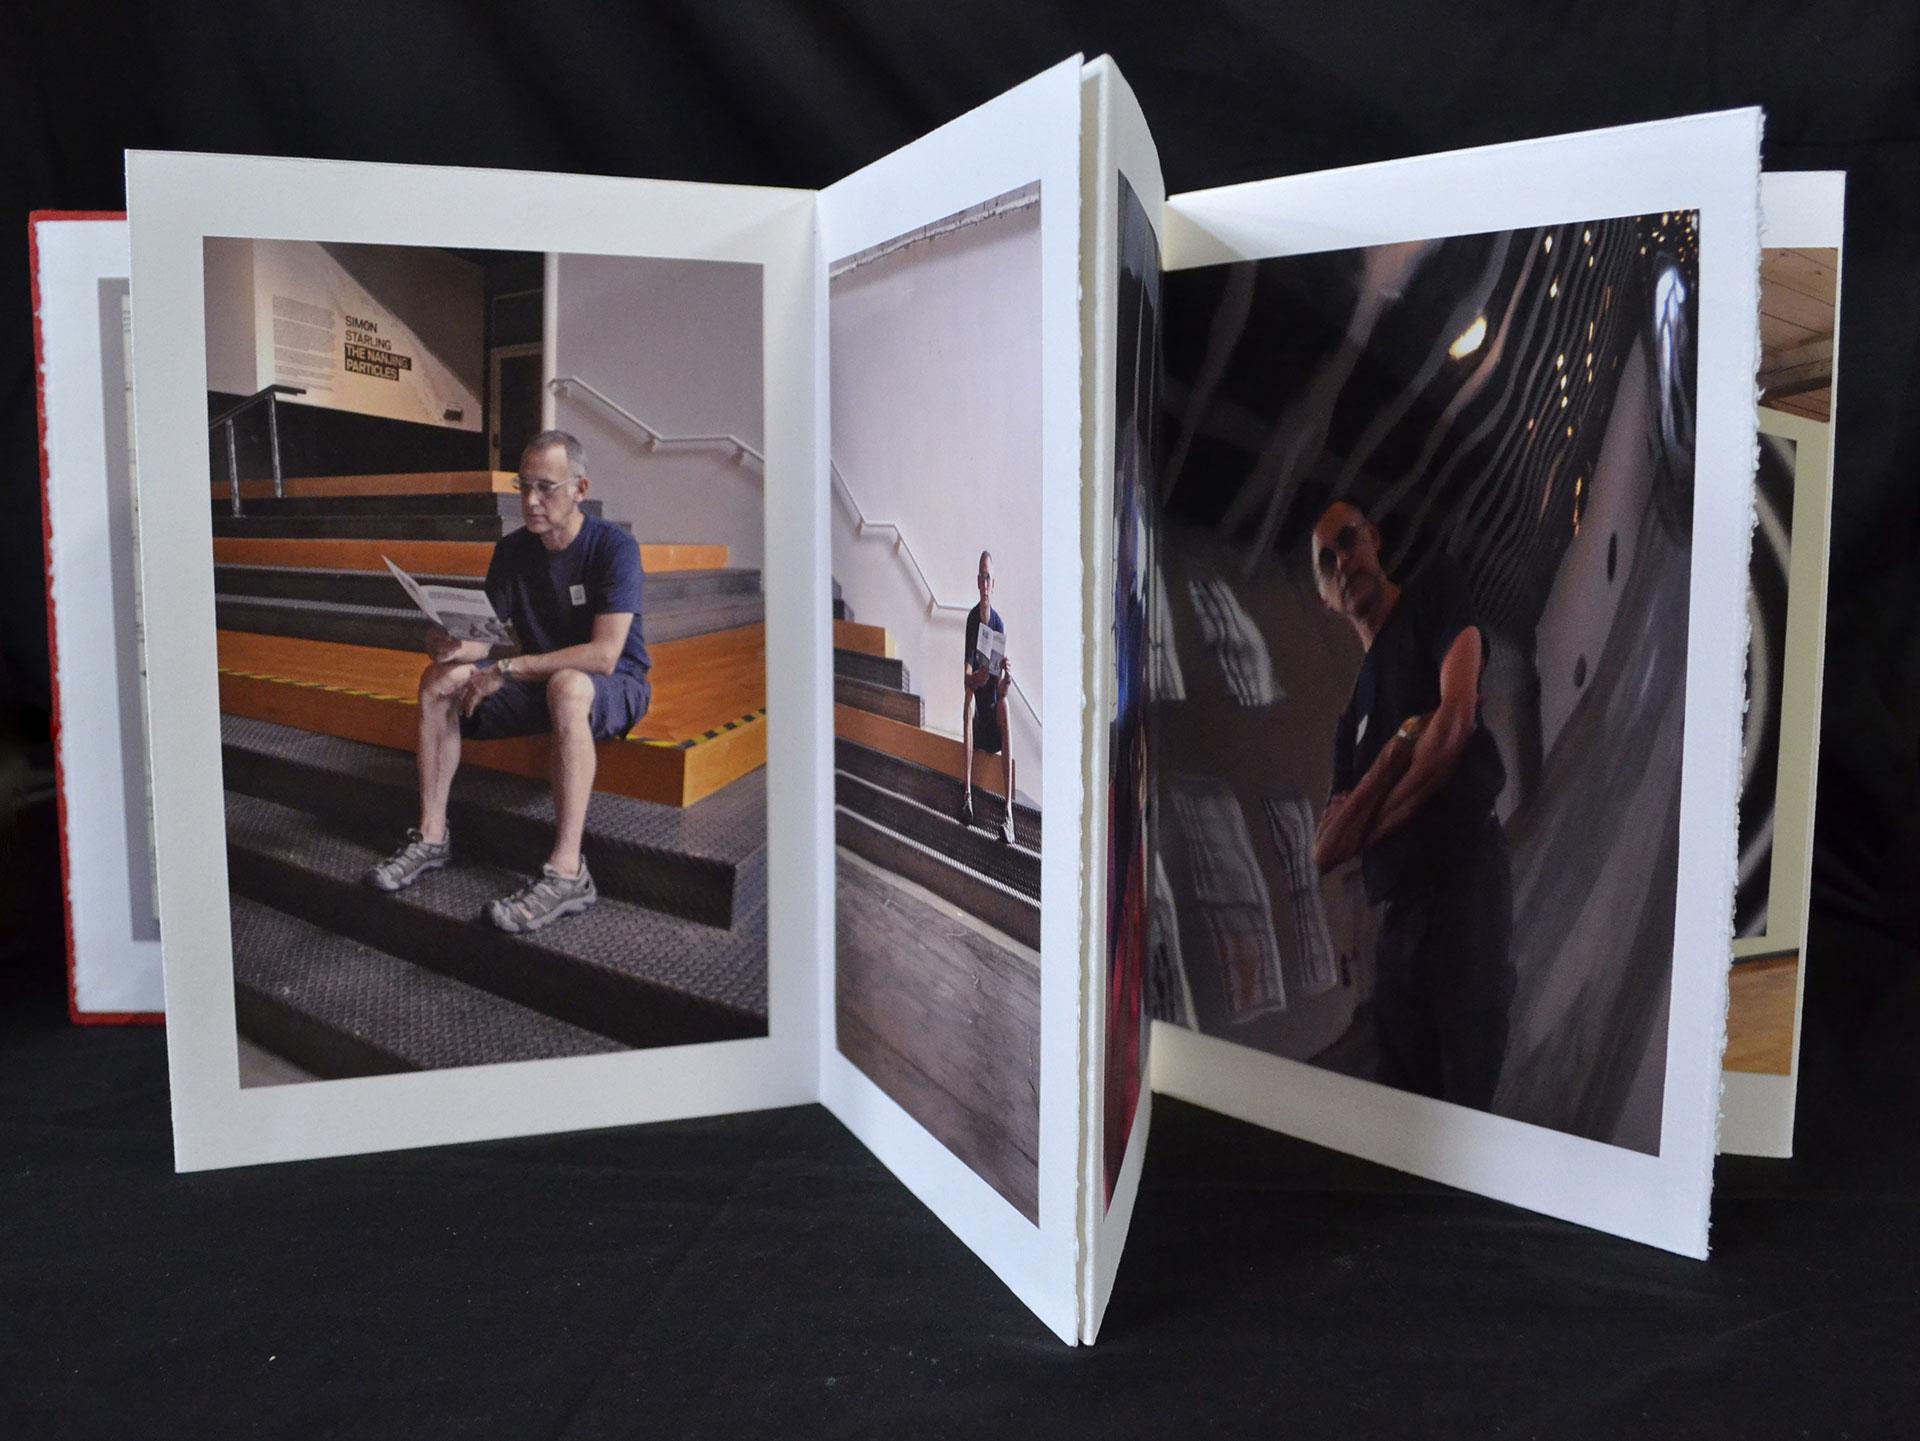 Laura Holland, Museum Rooms, Digital Prints in Accordion Book Format, 2011